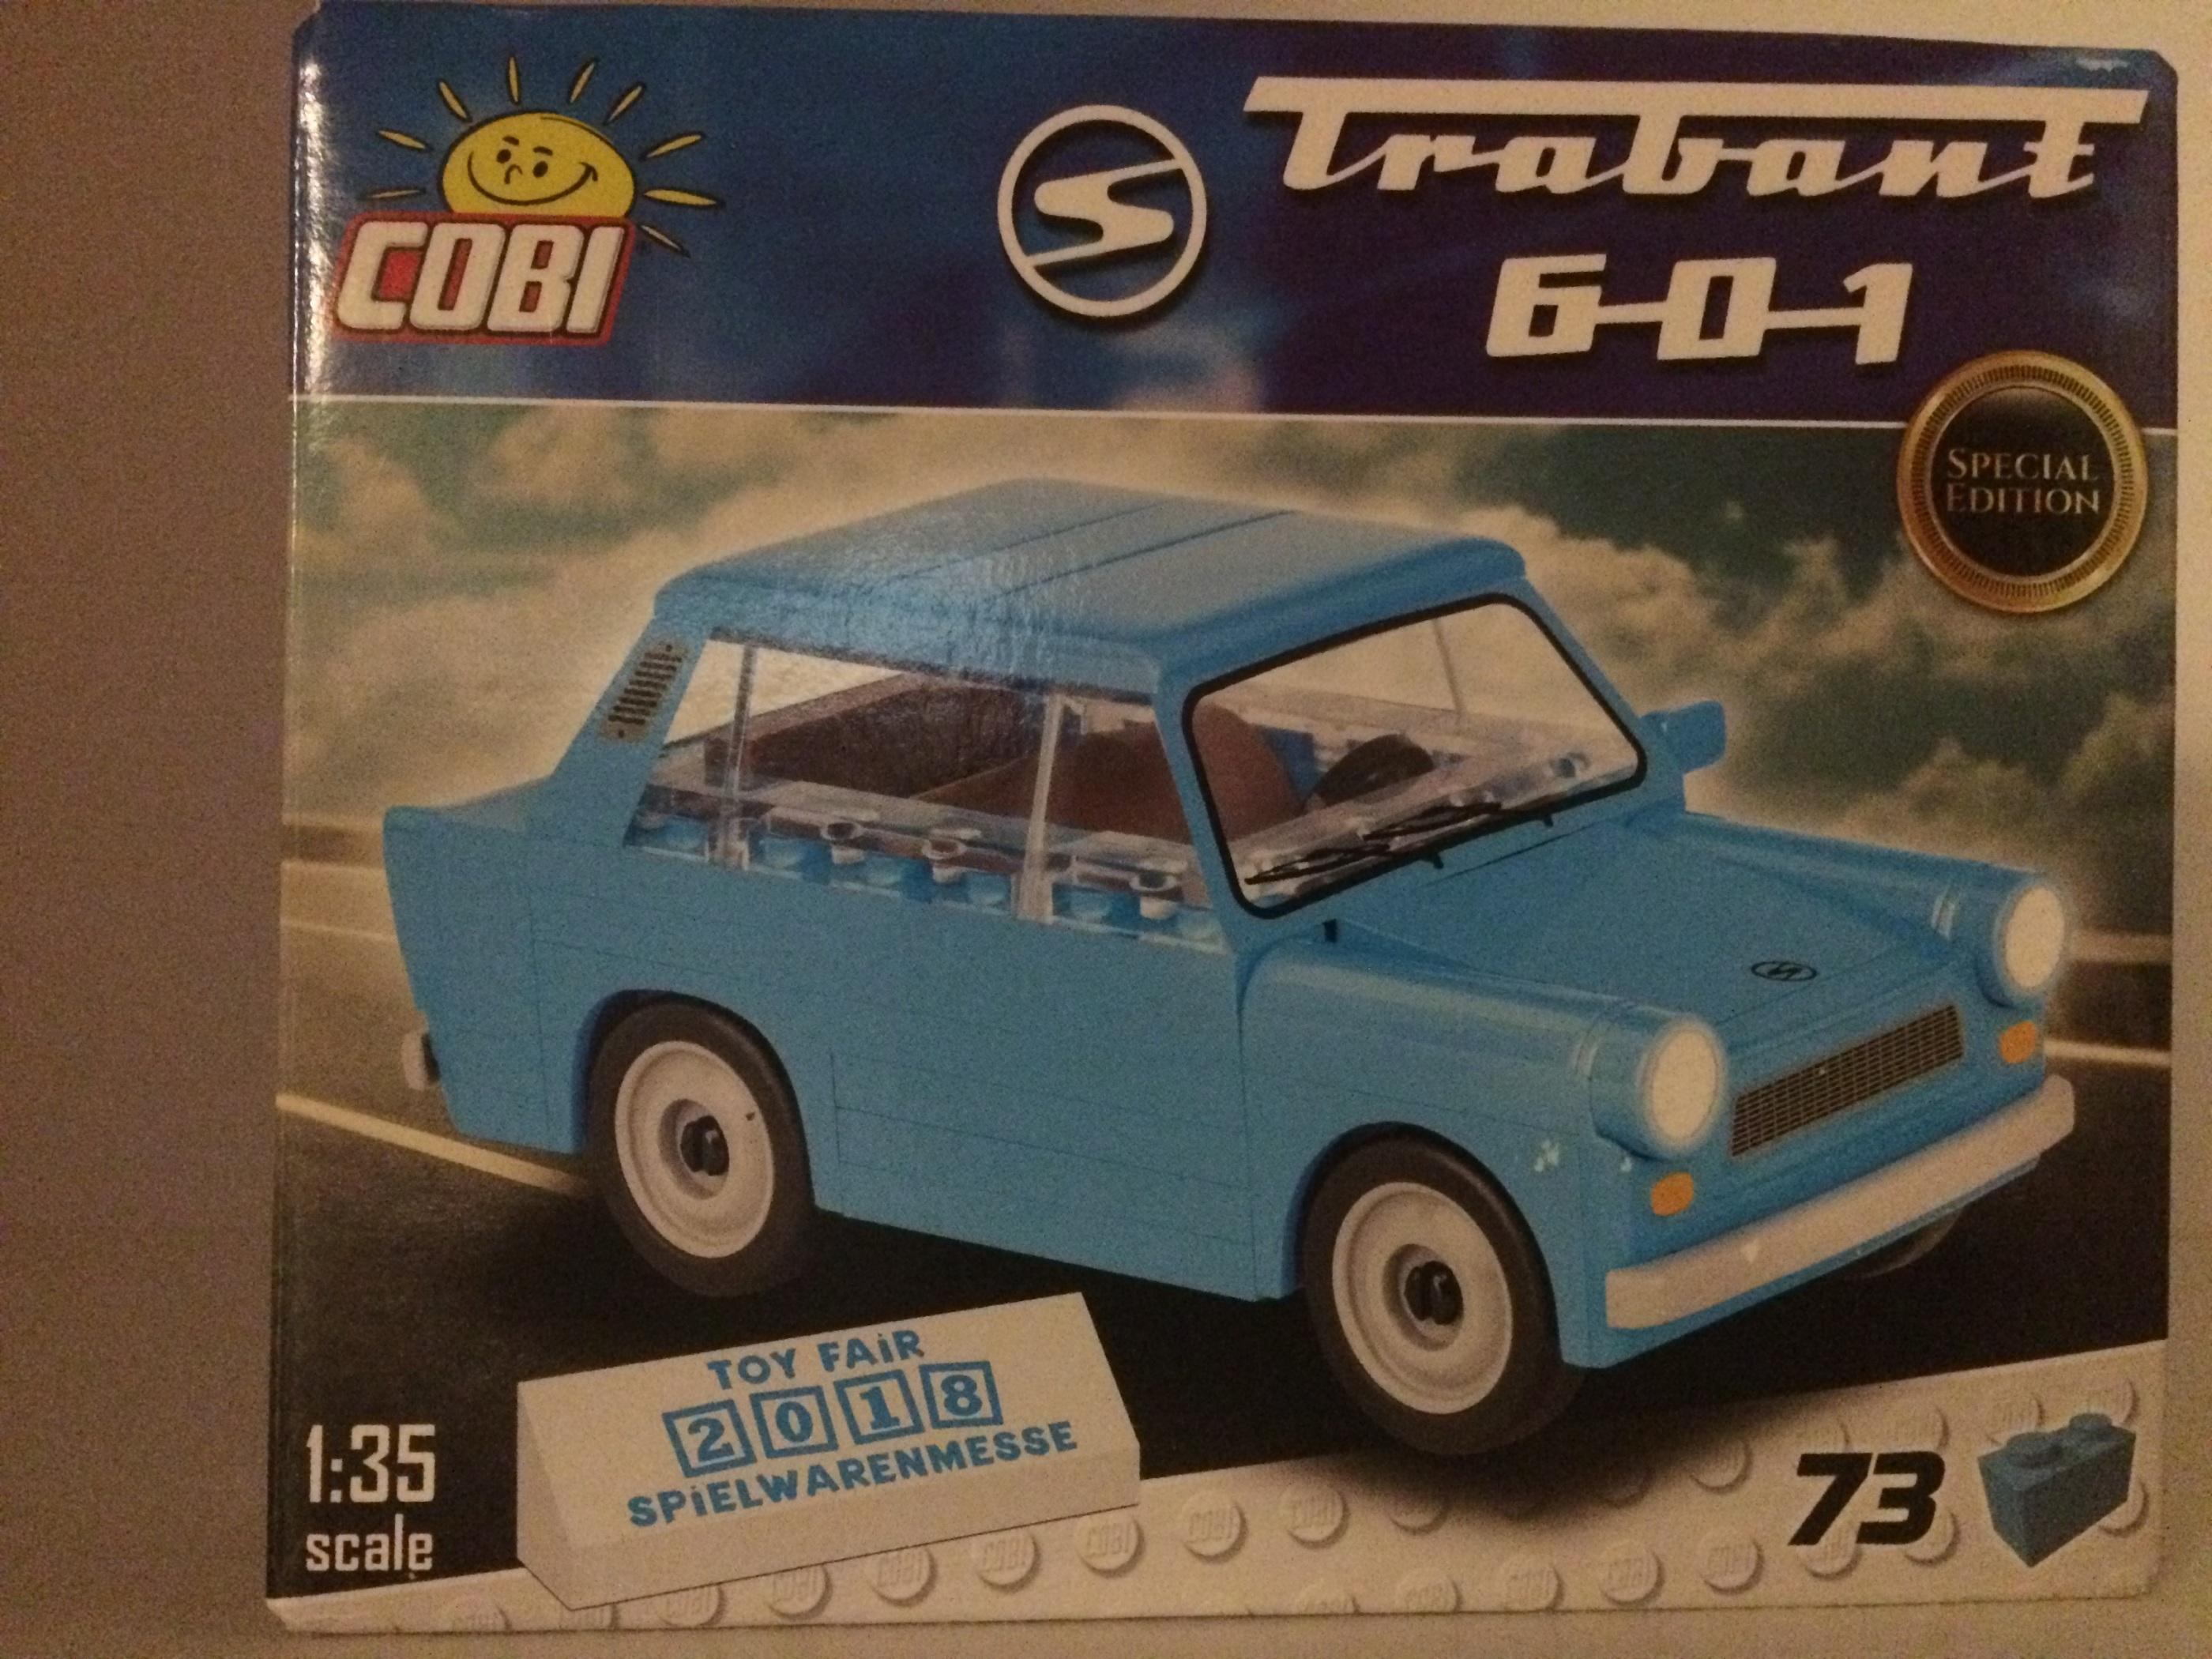 24539 - Trabant 601 Nuremberg Toy Fair Edition (version2)